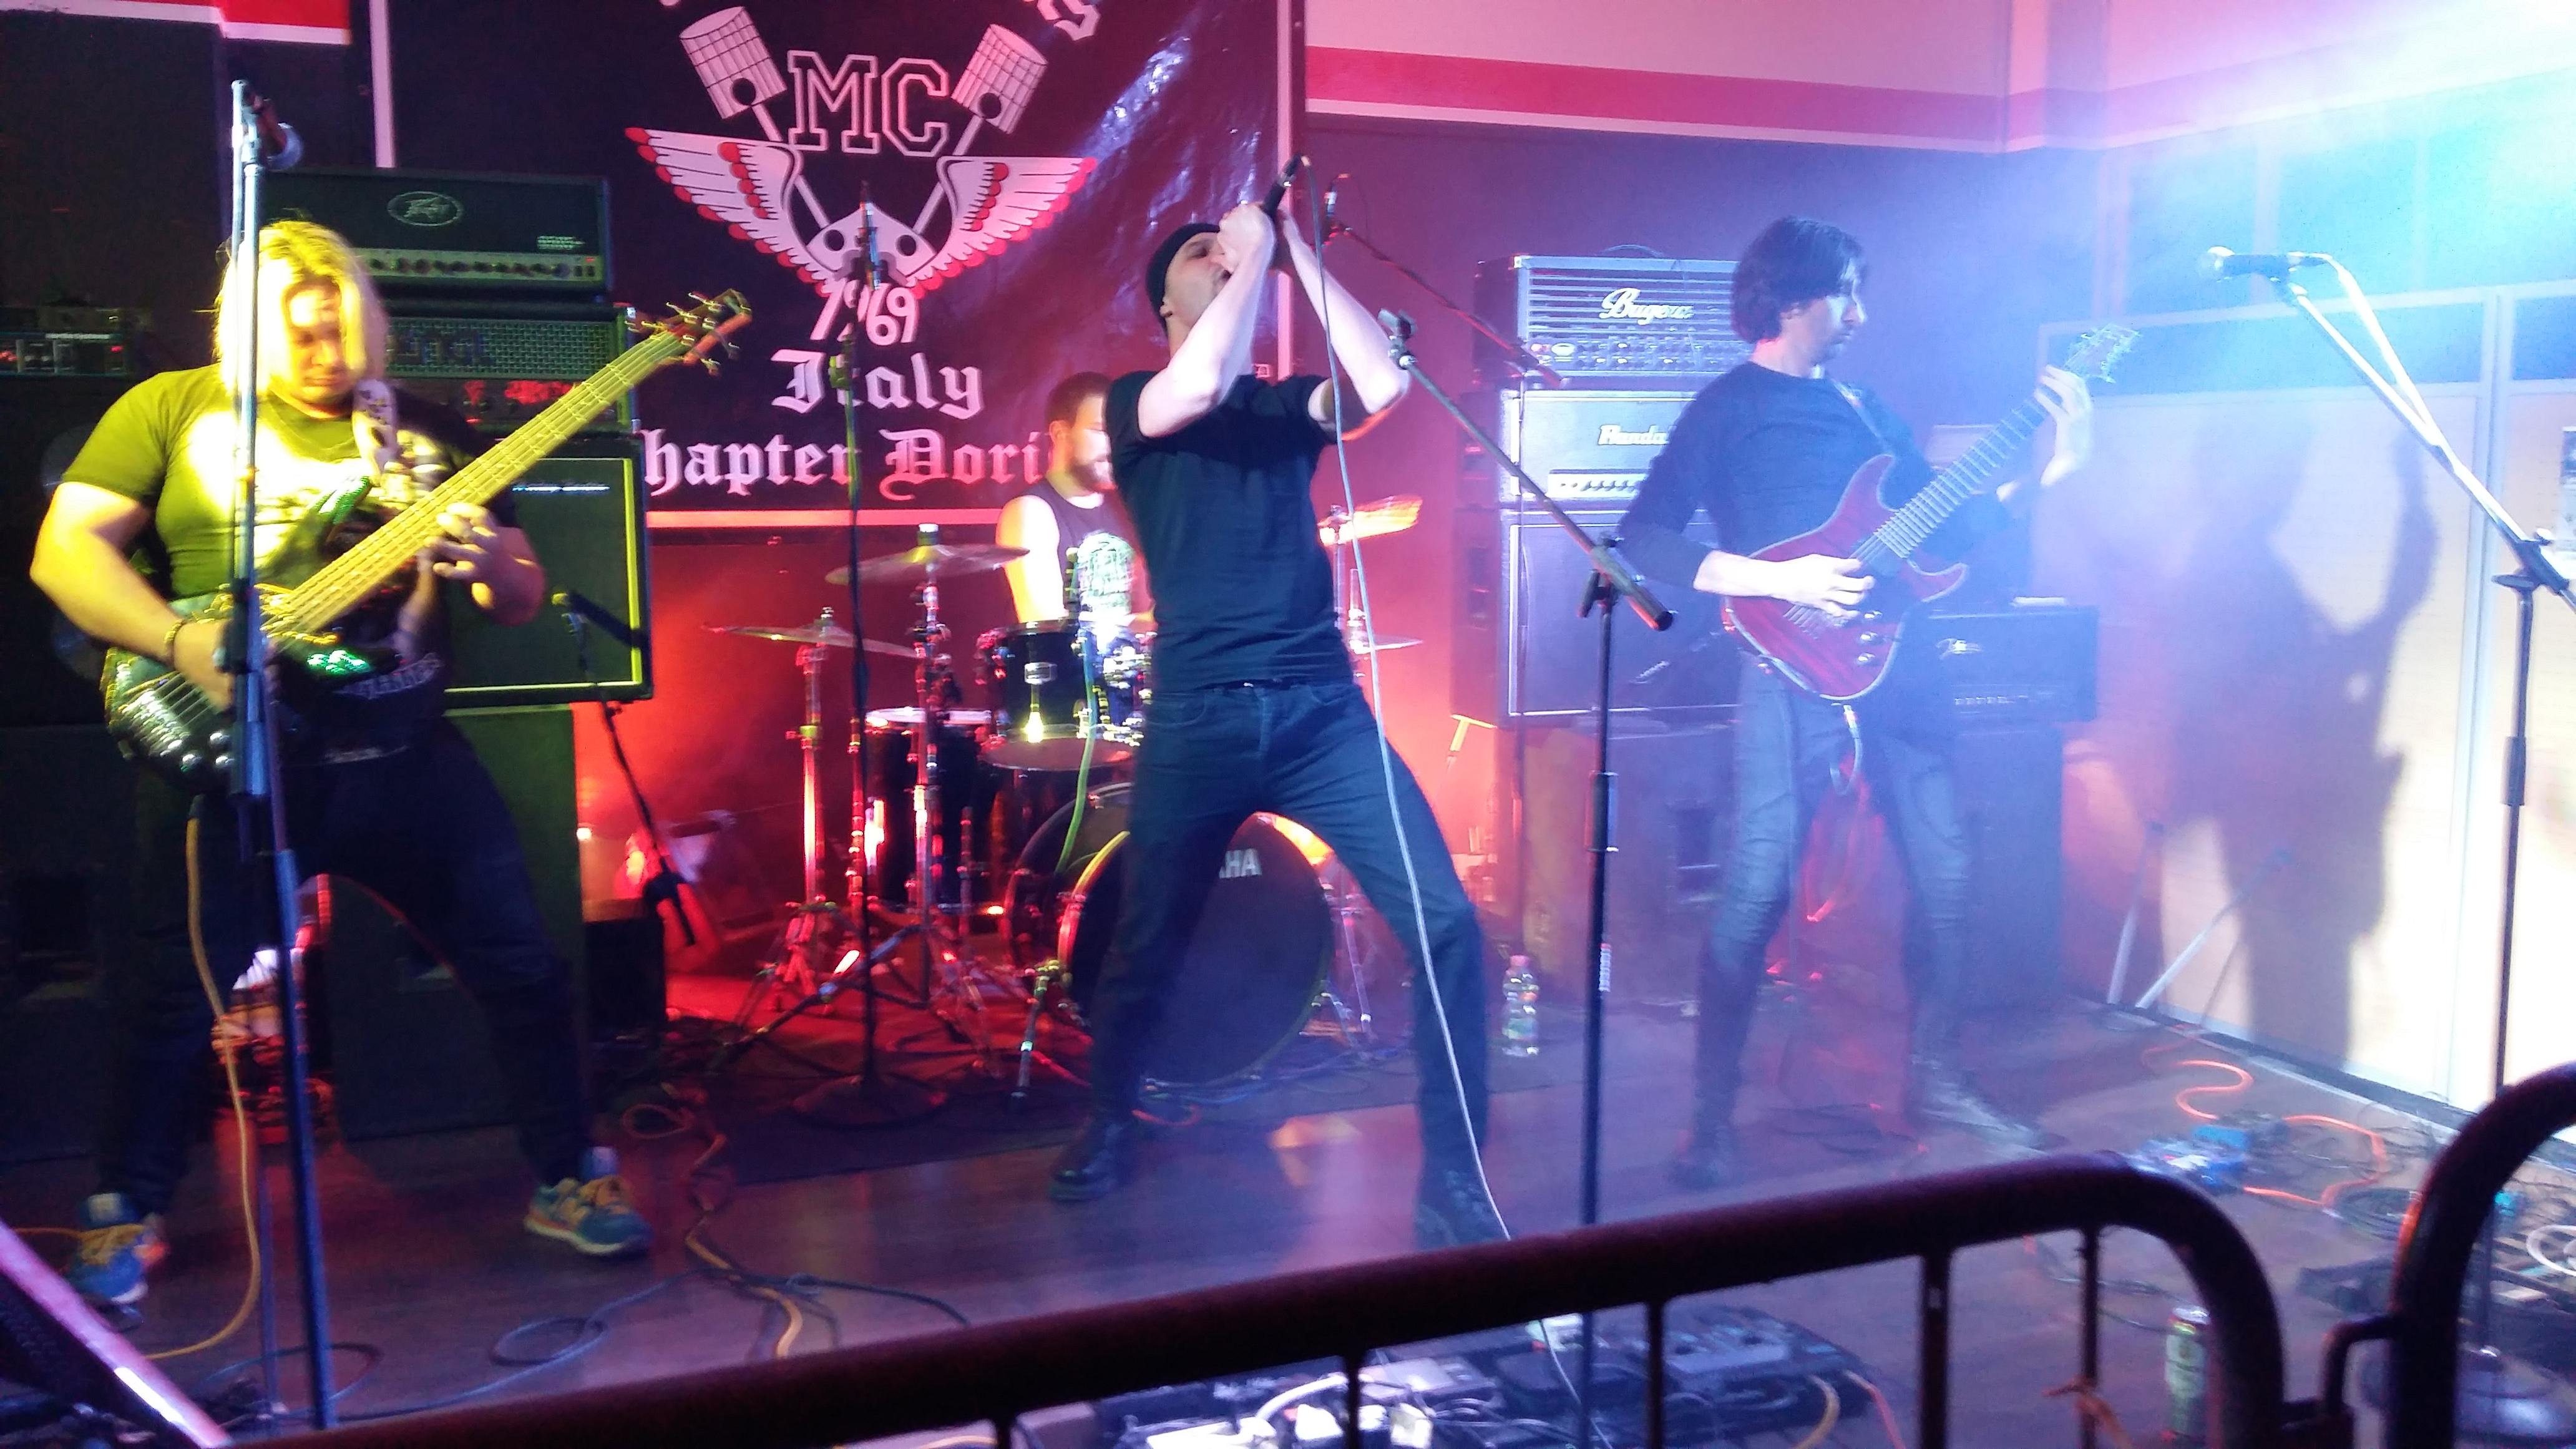 Live@Twister 24, Marche, Italy - 3.4.2015